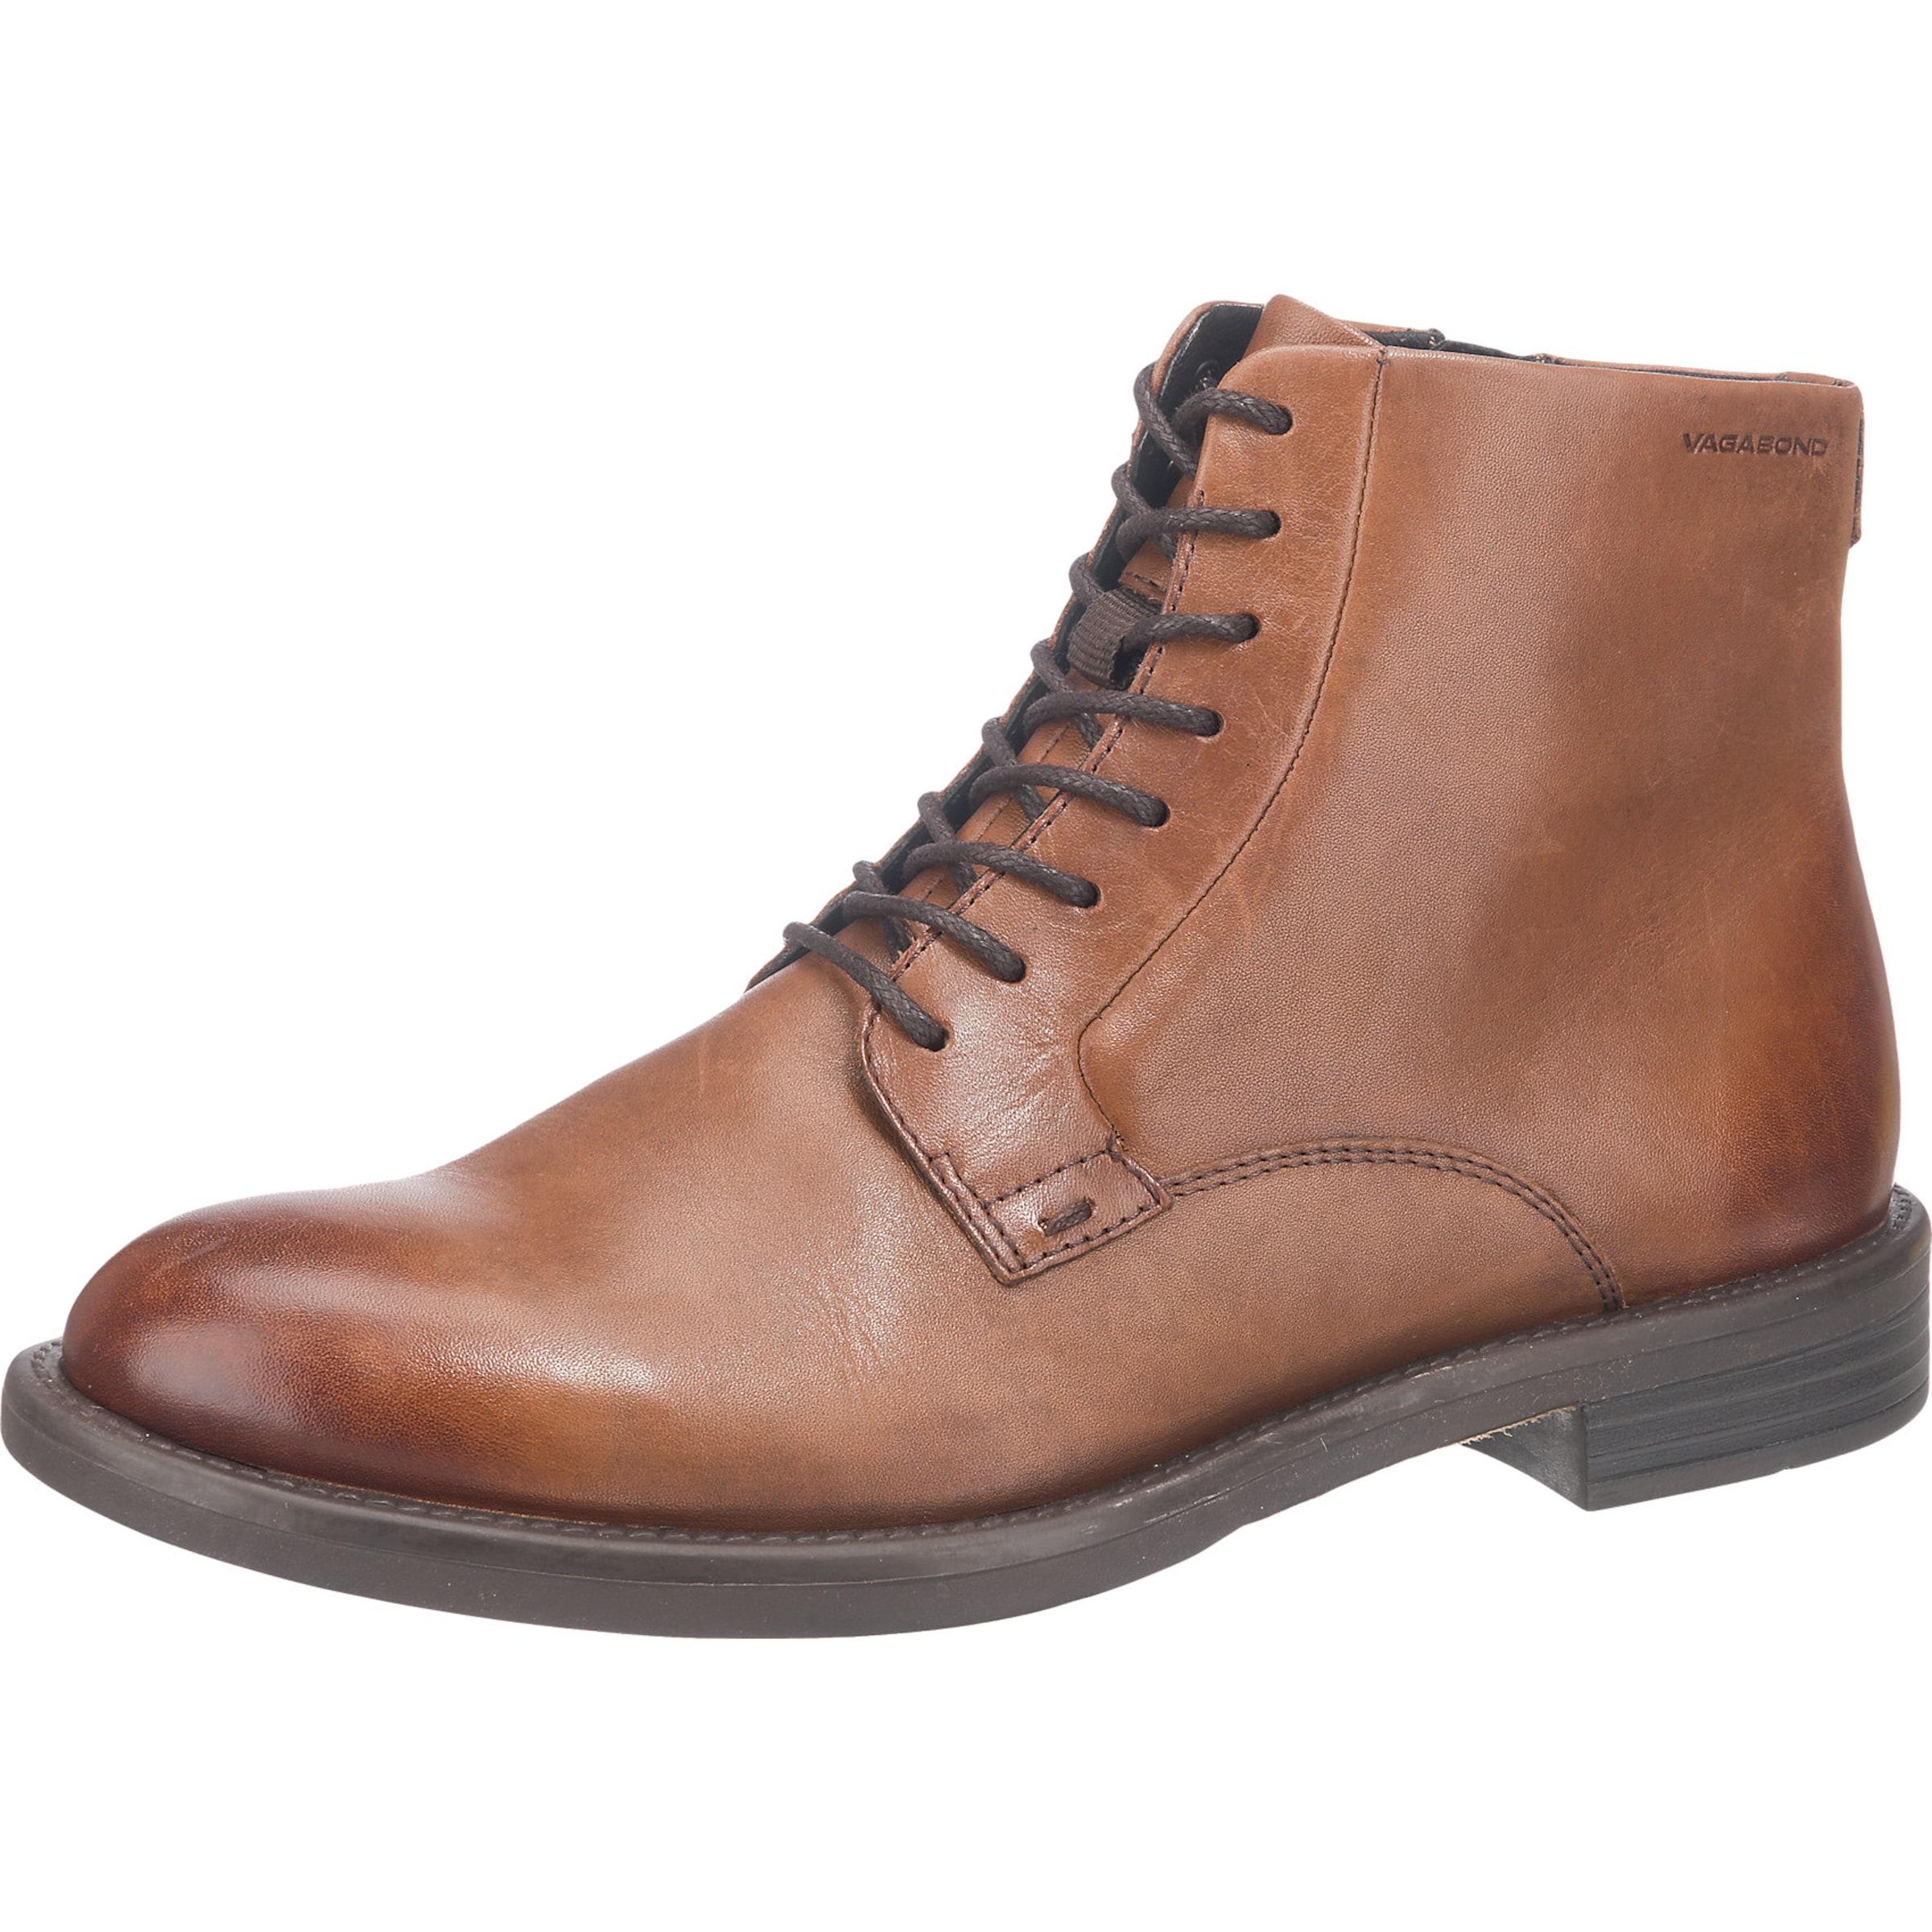 Haltbare Mode billige Schuhe VAGABOND SHOEMAKERS   'Amina' Stiefeletten Schuhe Gut getragene Schuhe